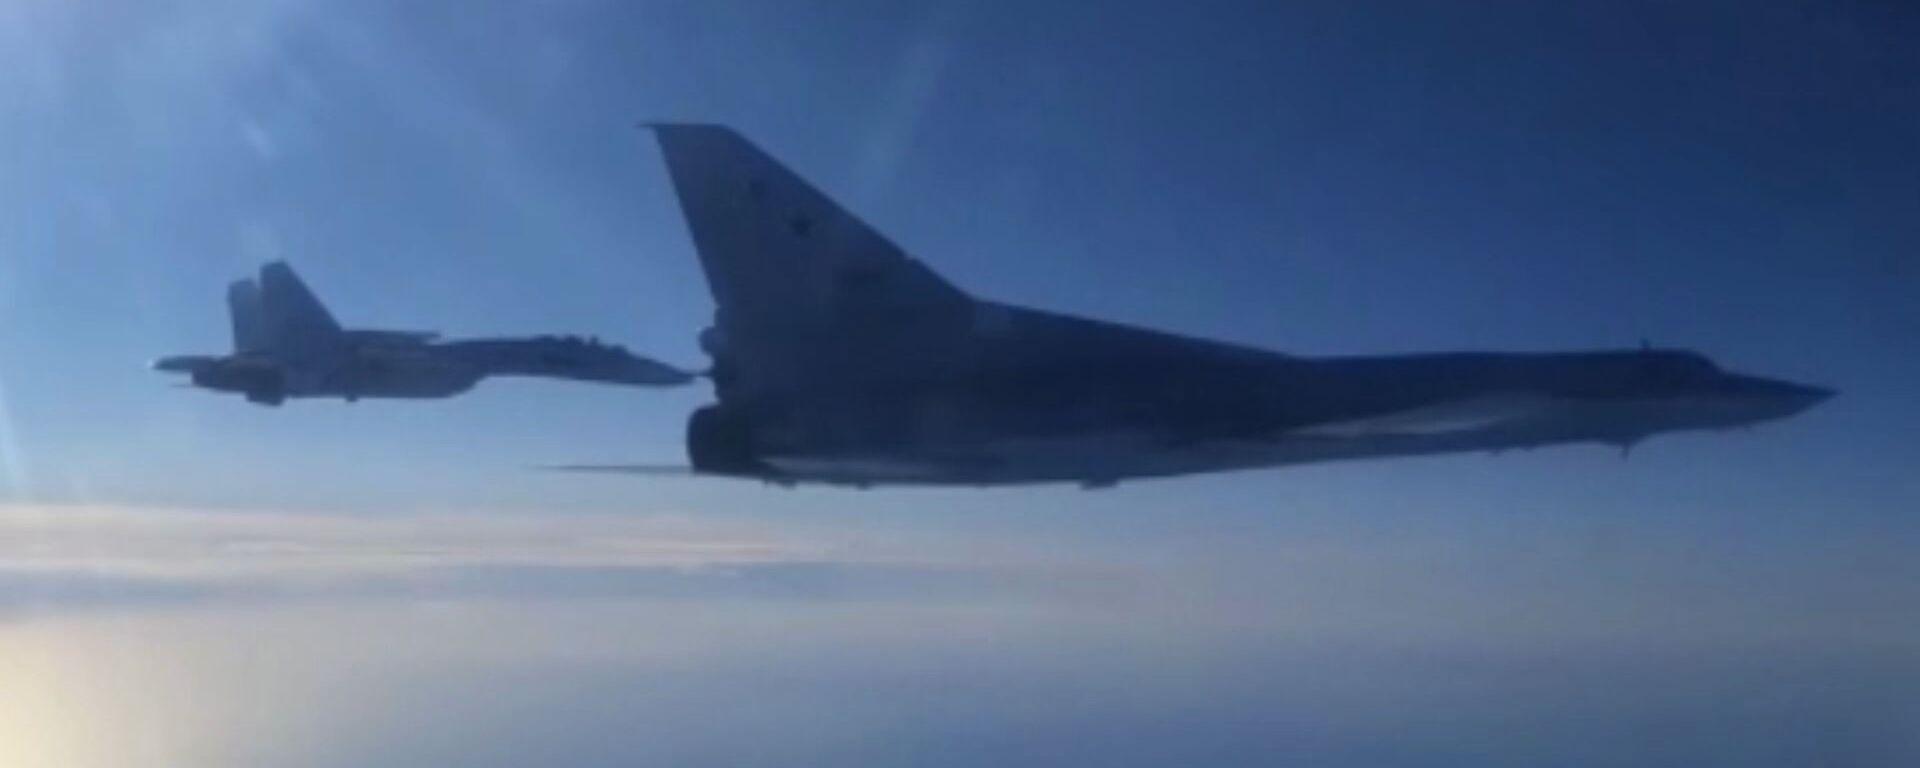 Rosyjskie bombowce Tu-22M3 - Sputnik Polska, 1920, 06.08.2021